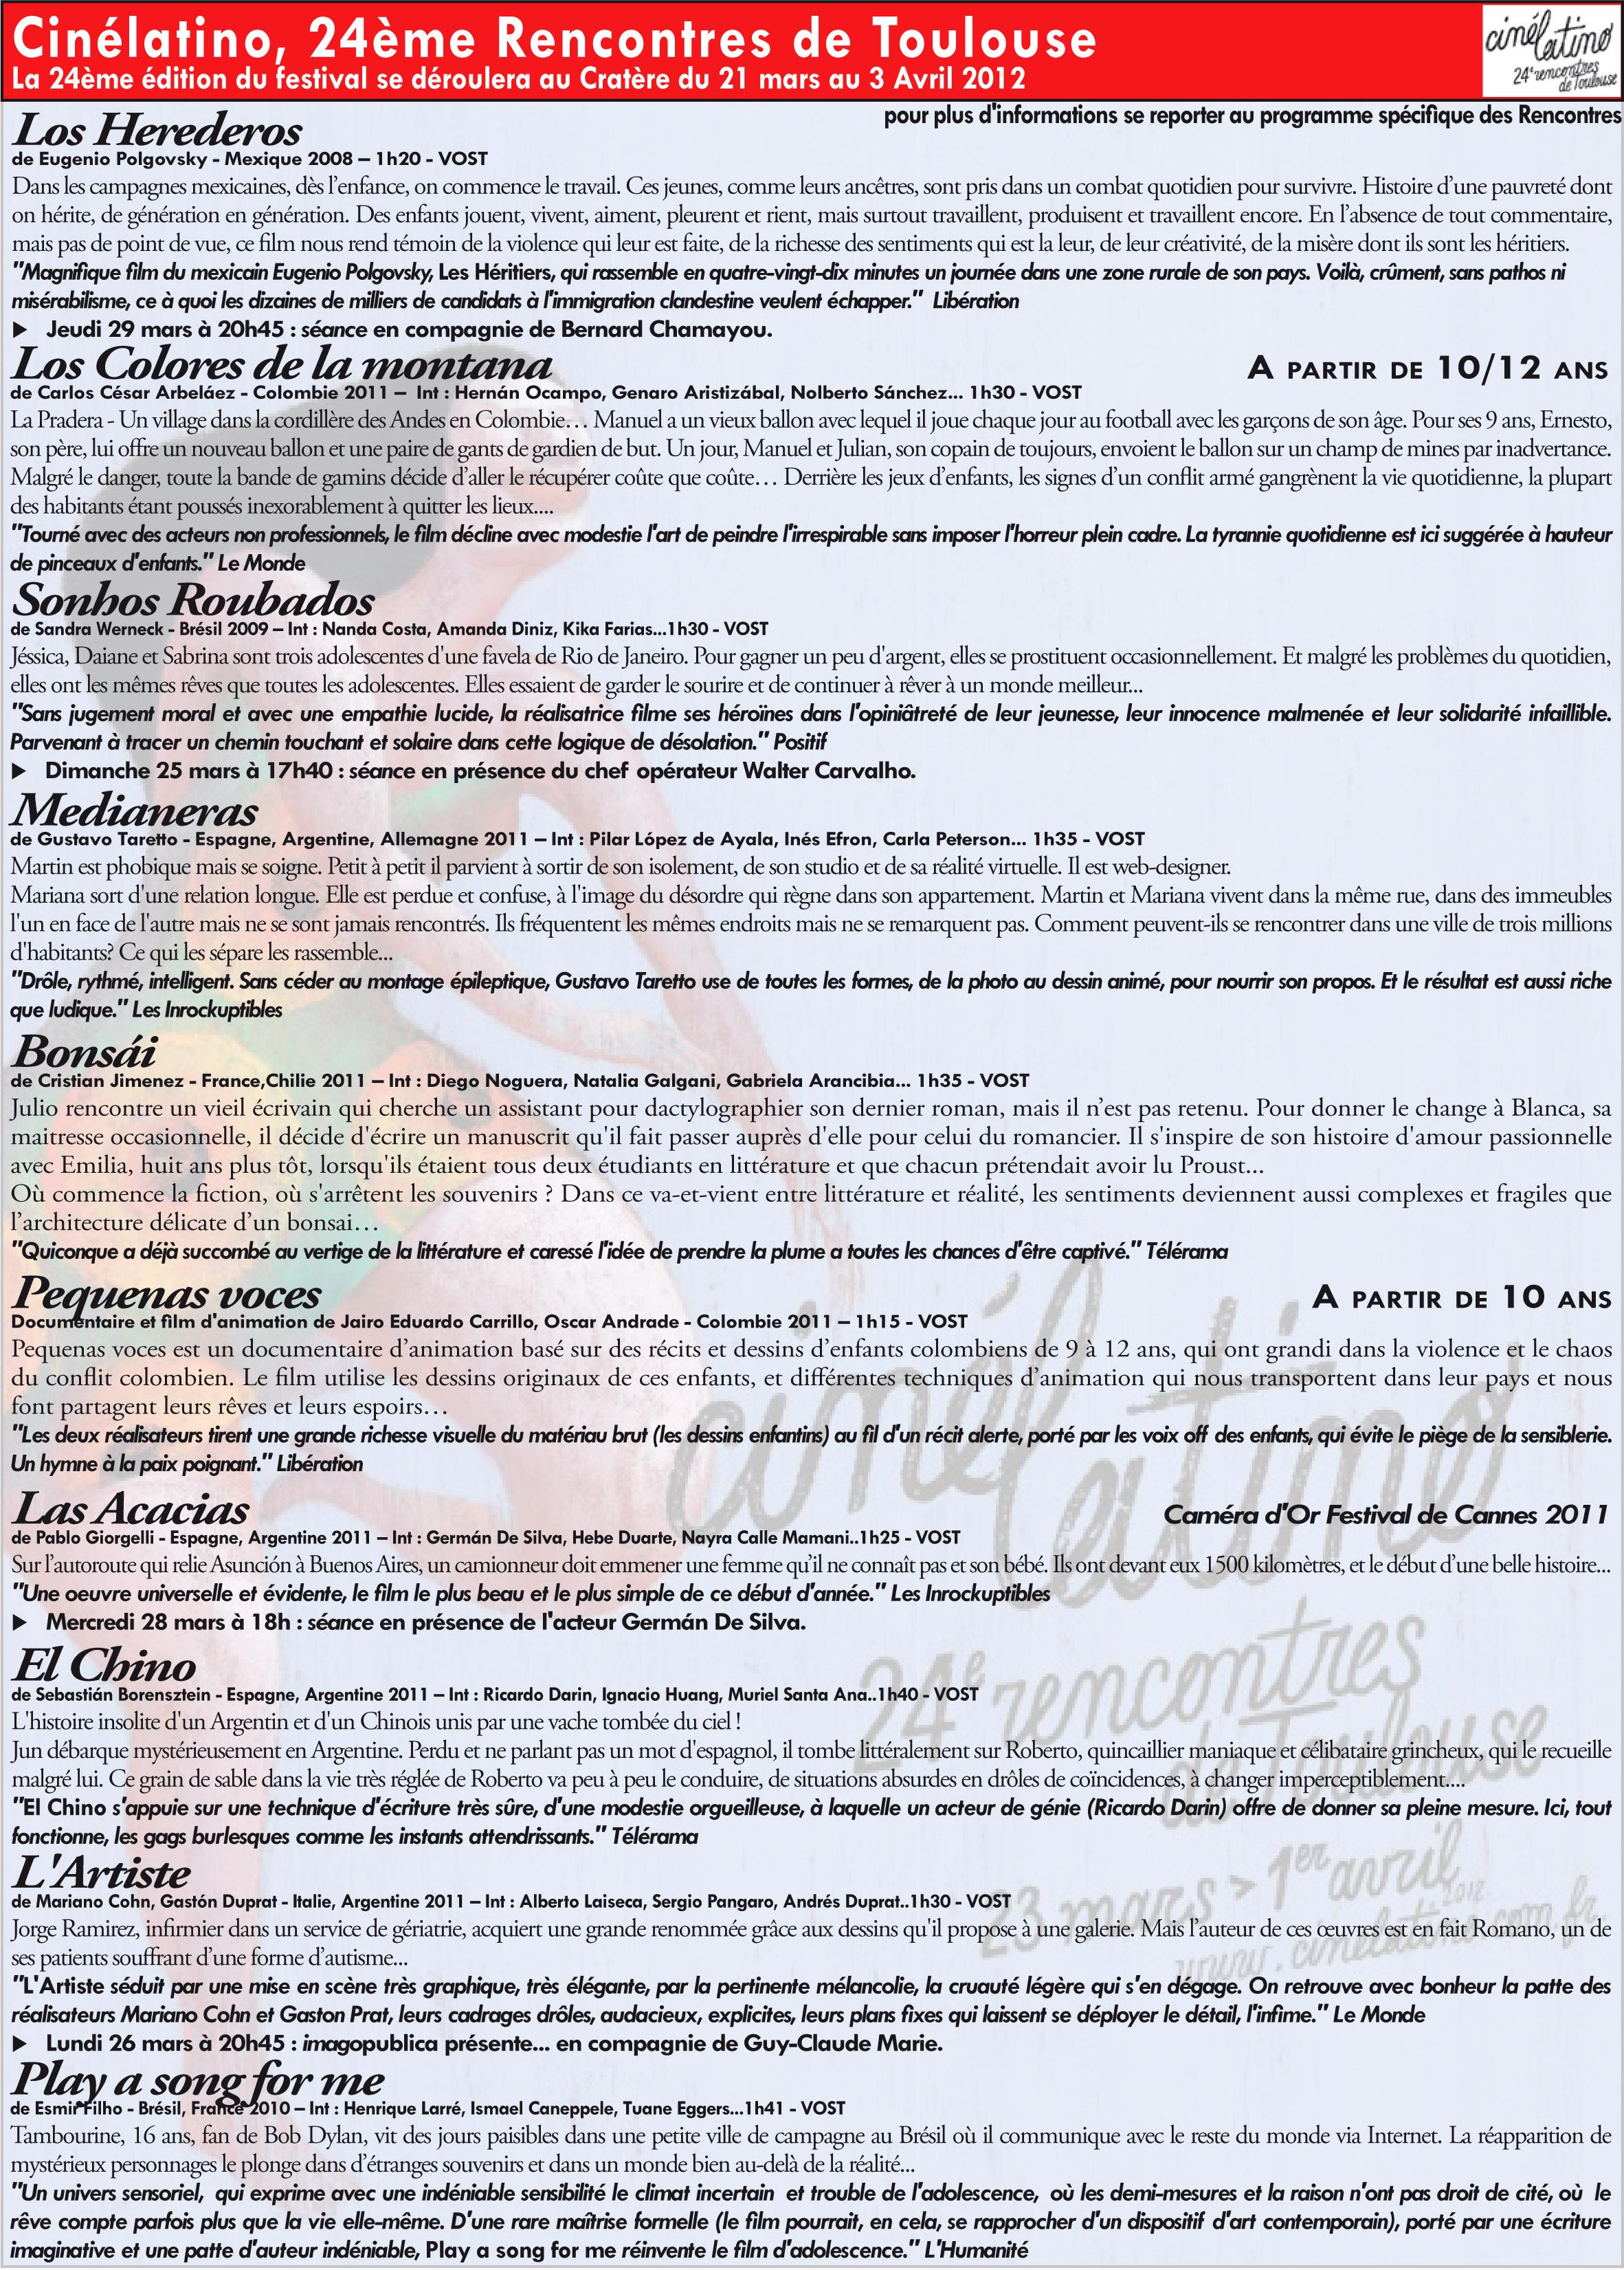 Legal information of RENCONTRES CINEMA AMERIQUE LATINE